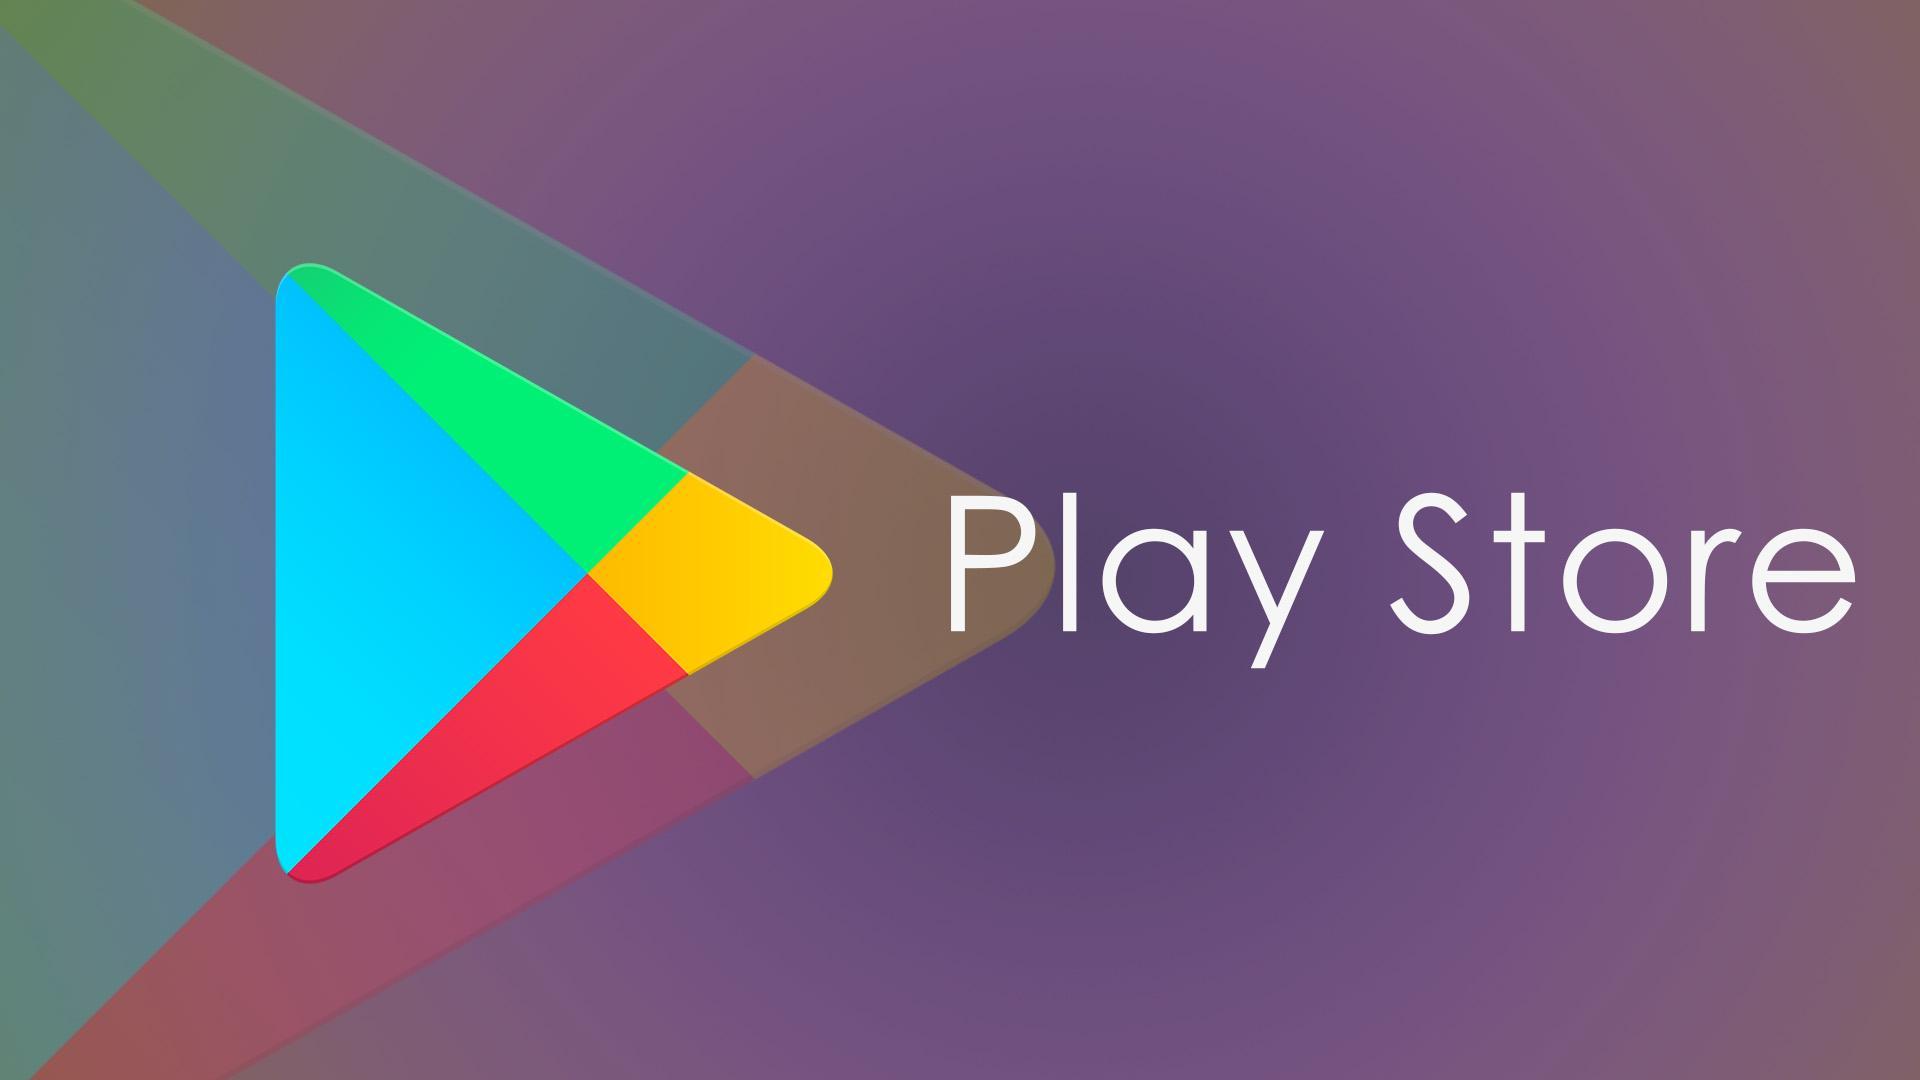 Logotipo Play Store Android con fondo morado